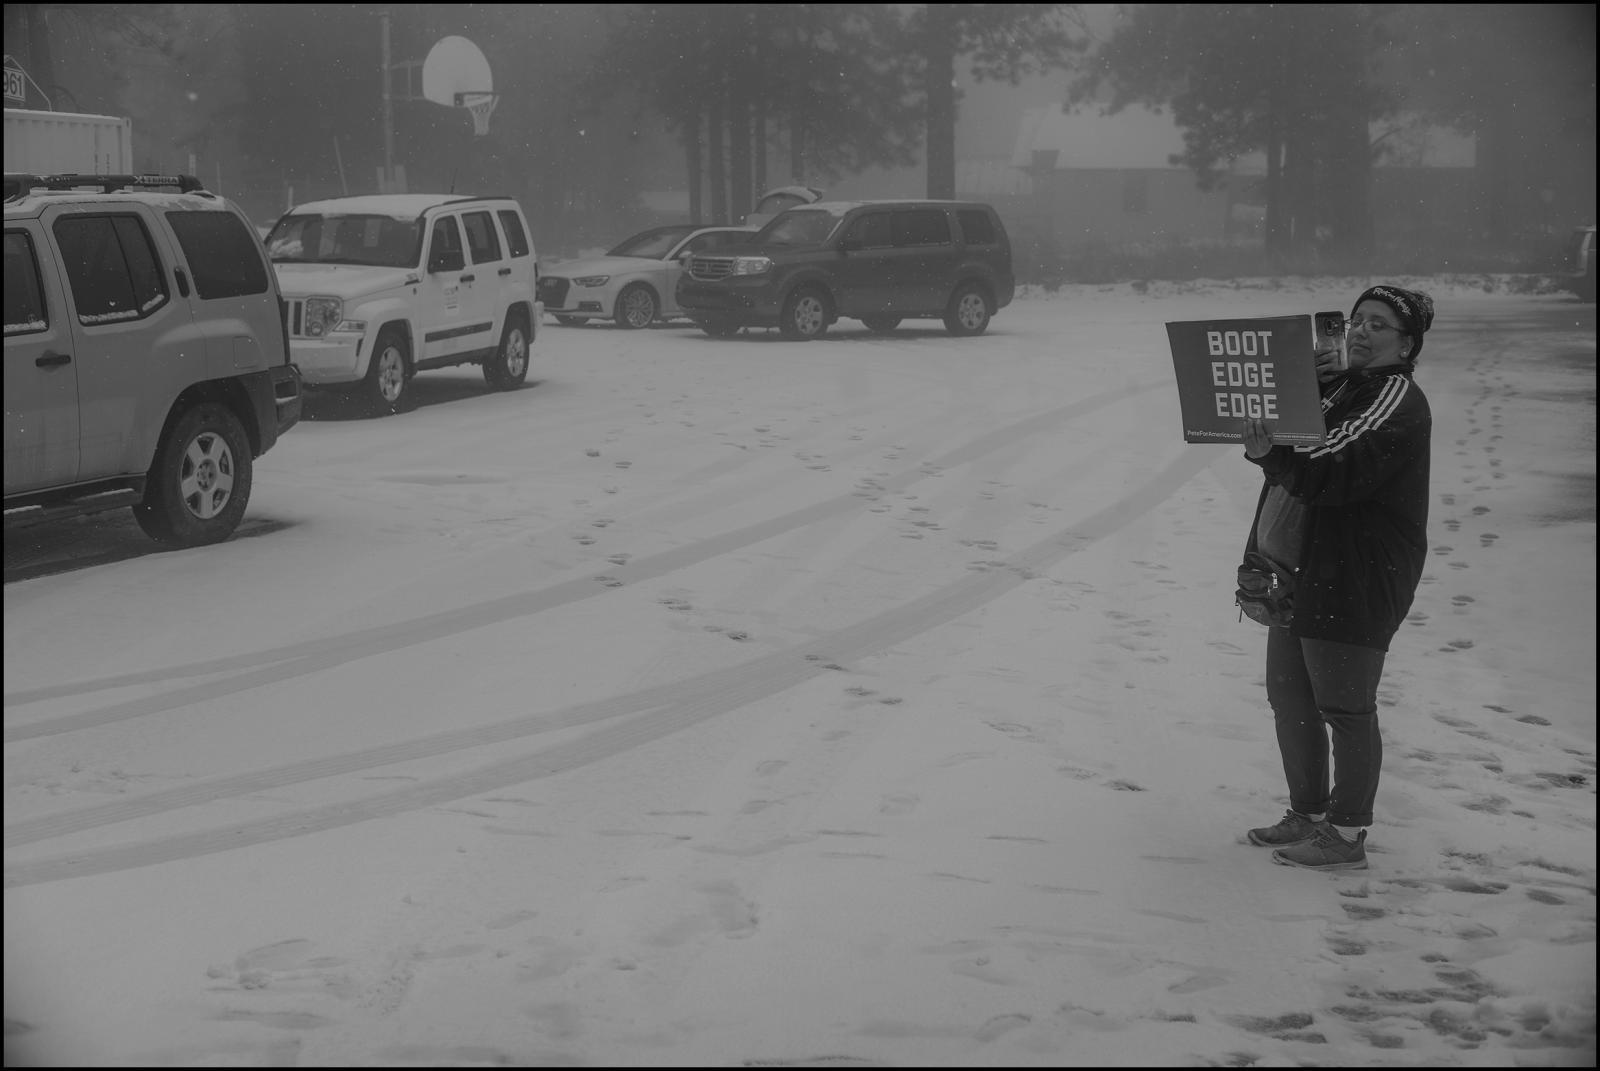 Volunteer/observer Abril Villanueva in snowstorm in the mountaintop village of Mt. Charleston, Clark County Nevada. February 2020.